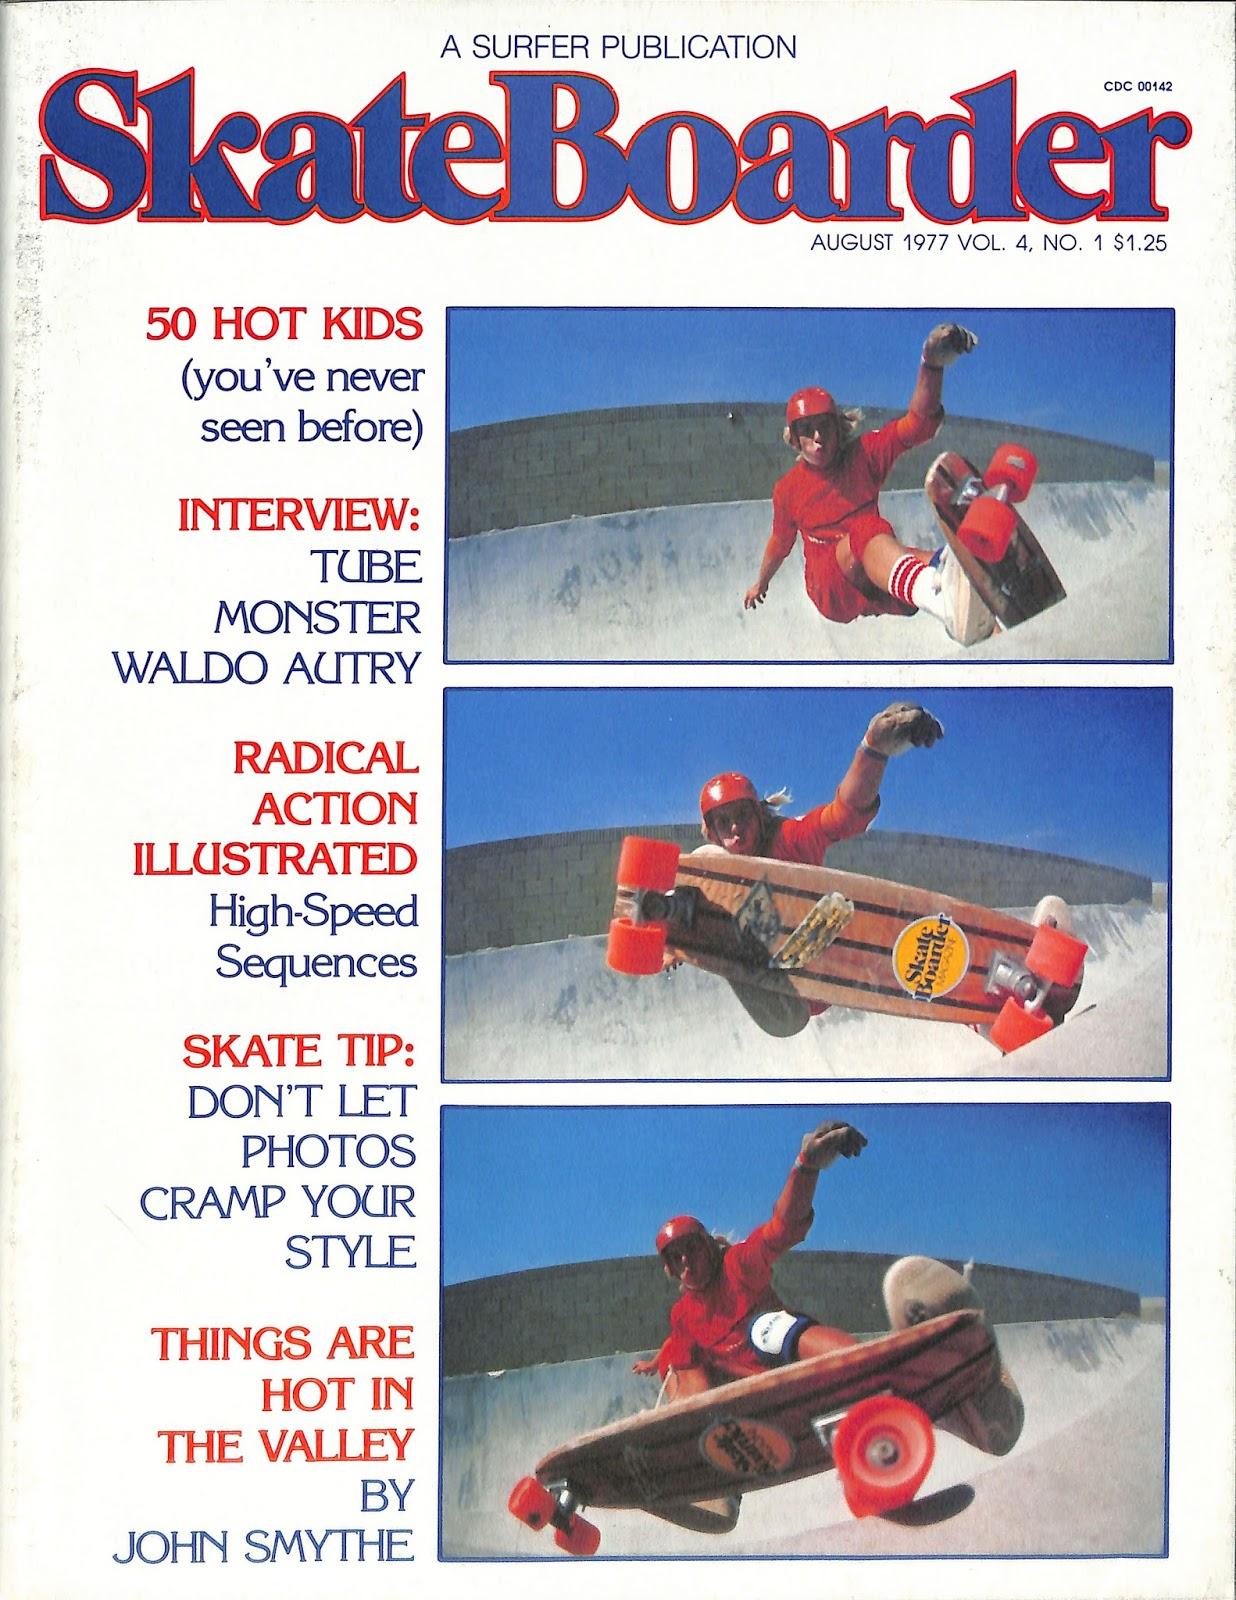 Skateboard Magazine Archive: Skateboarder August 1977